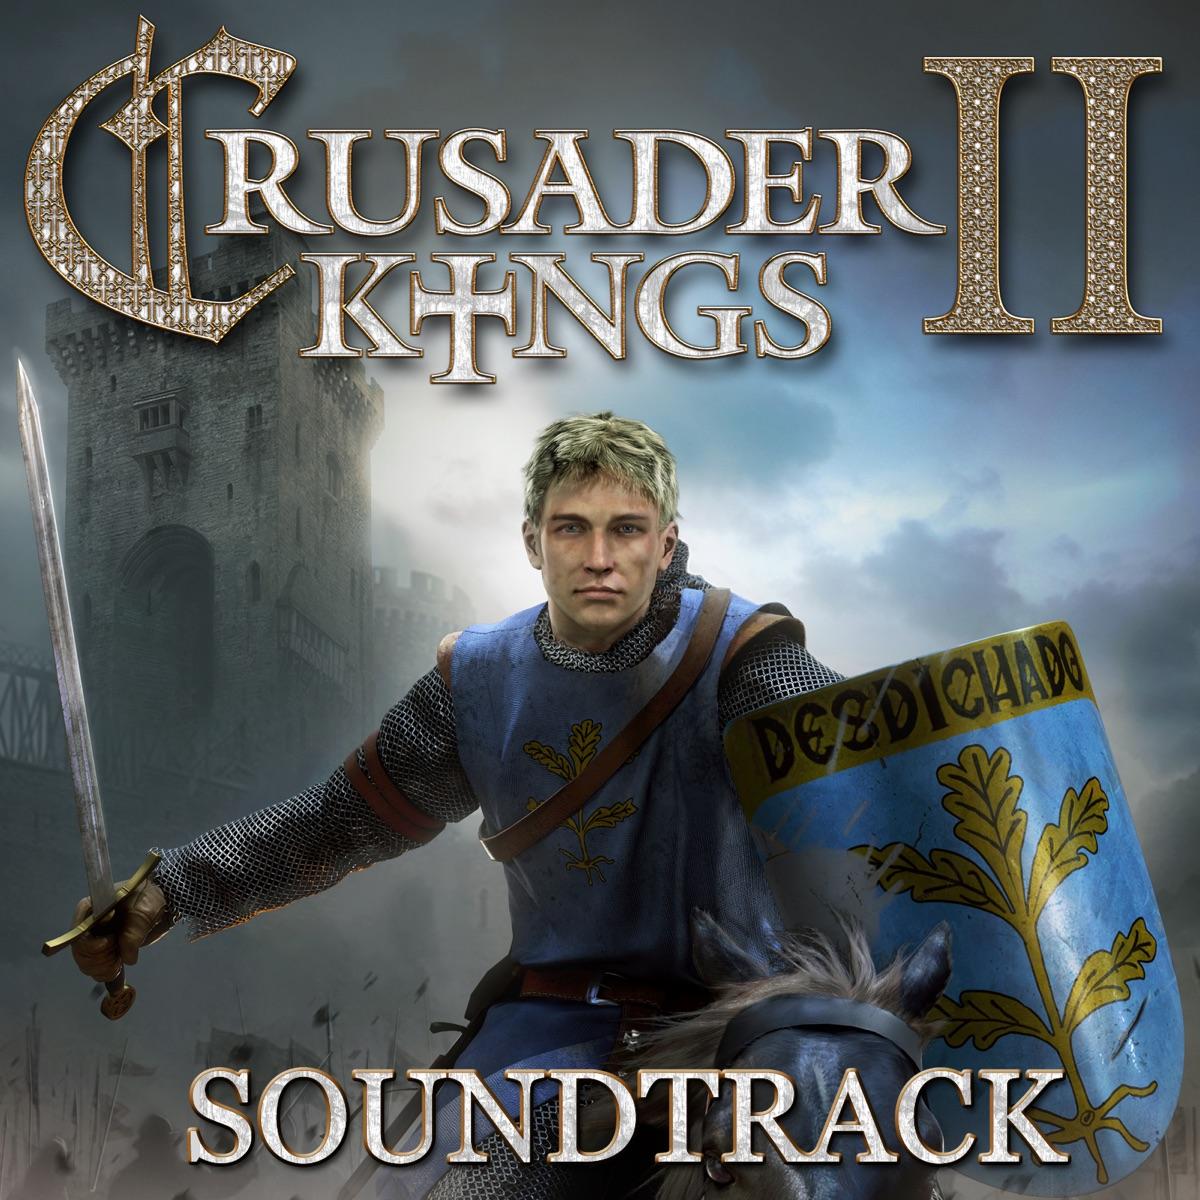 Crusader Kings II Album Cover by Paradox Interactive